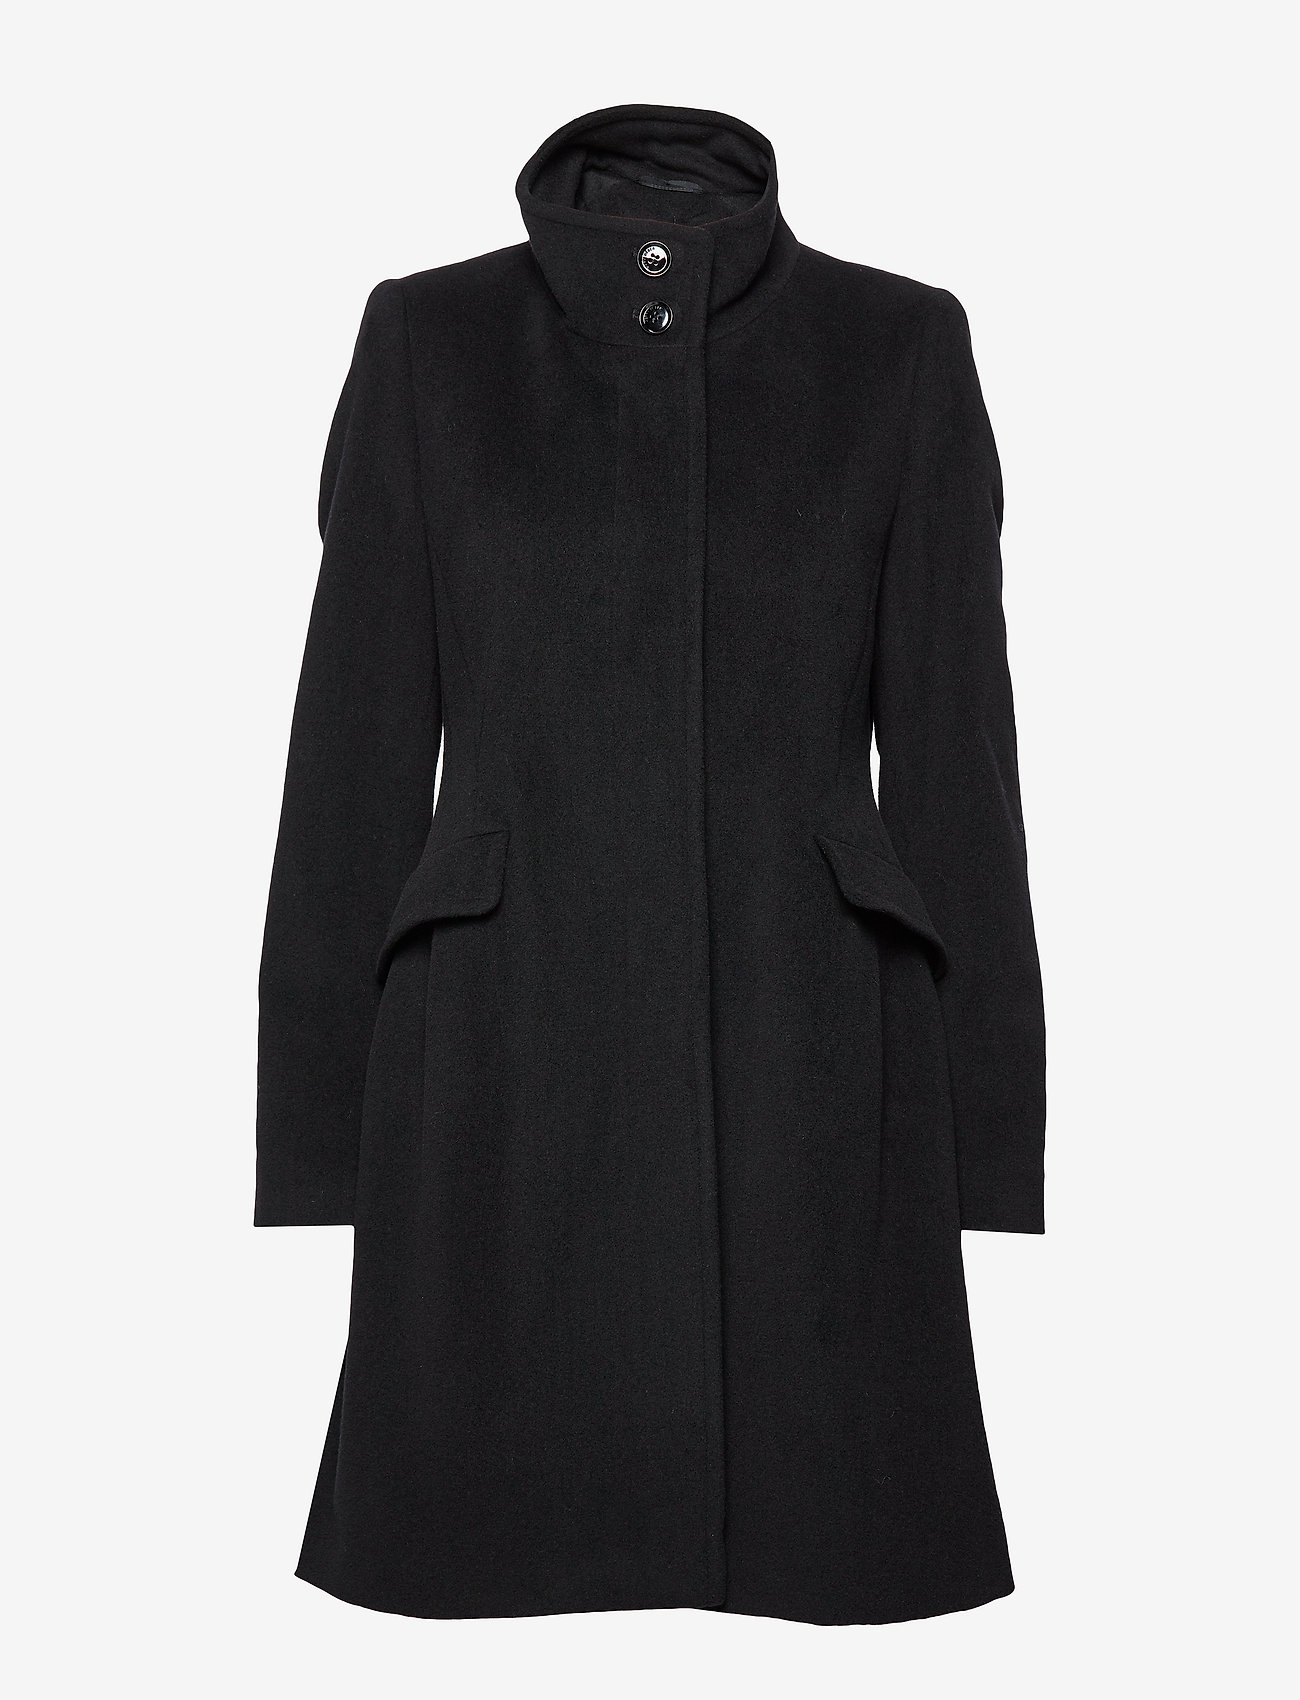 Coat Wool (Black) - Gerry Weber Edition wcIVPx